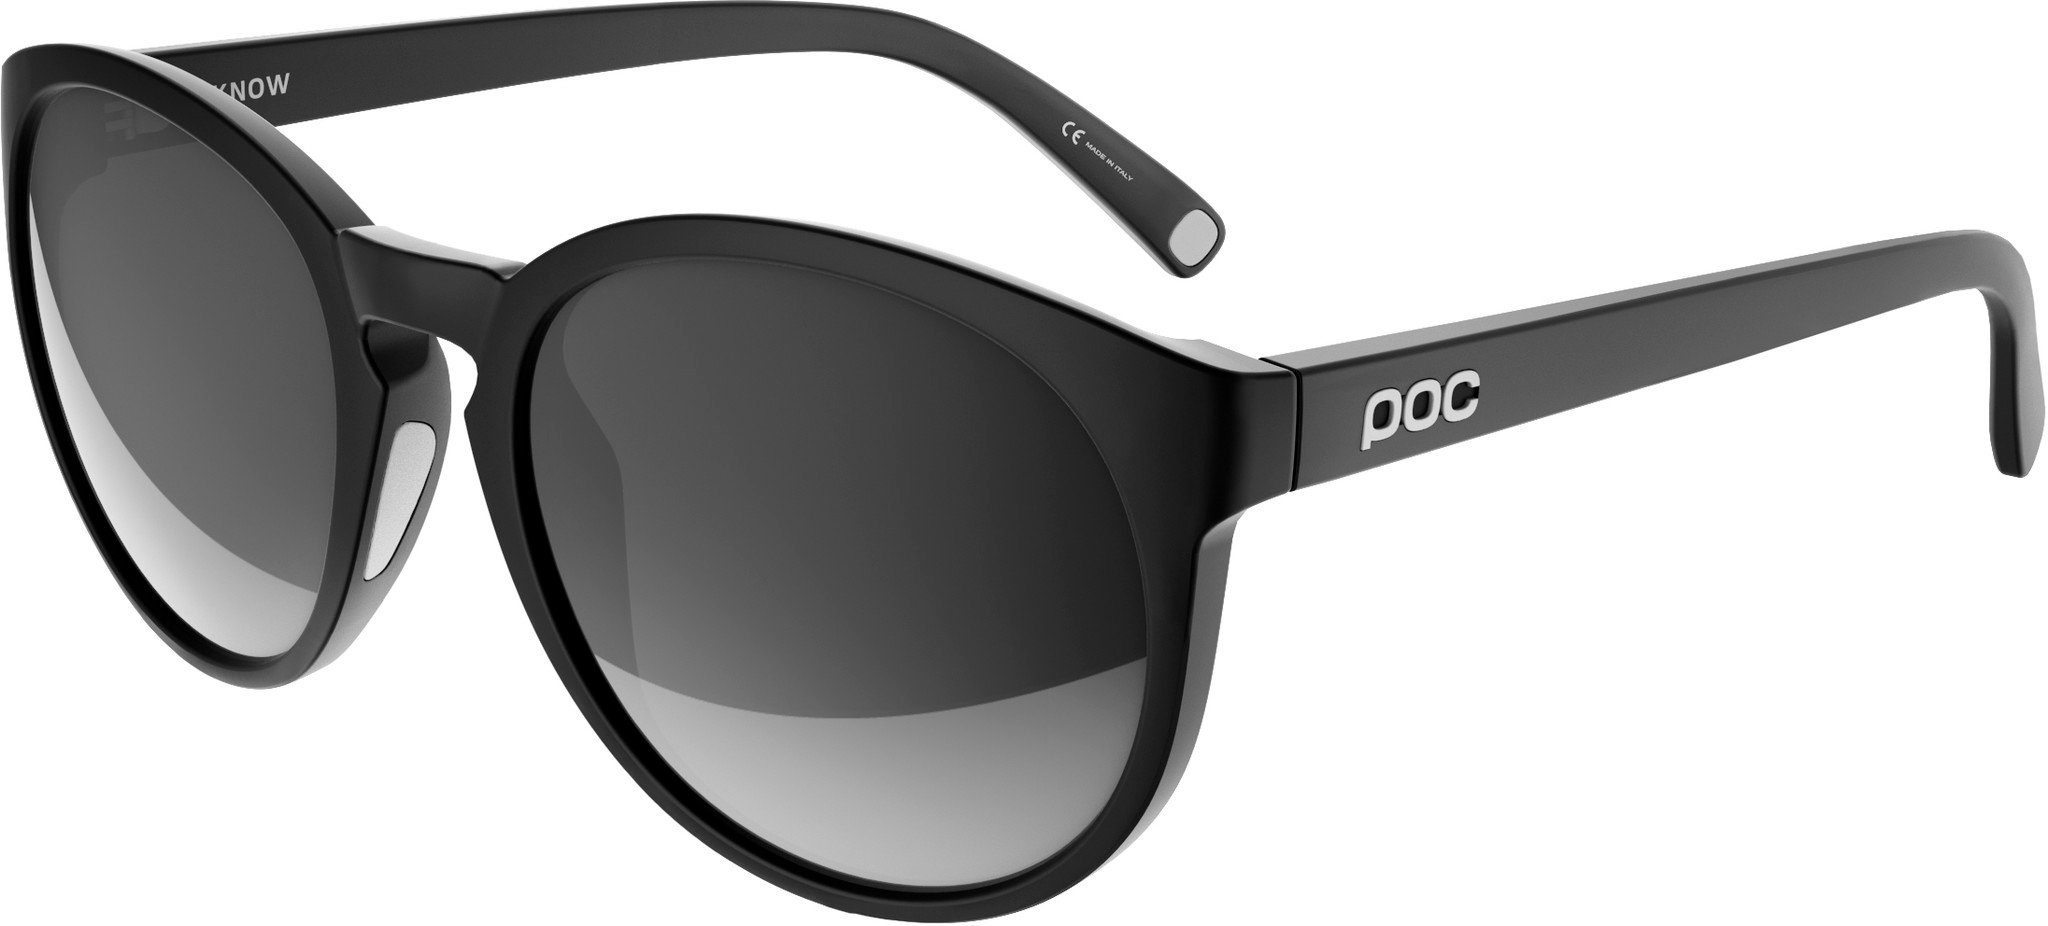 POC Sportbrille »Know«